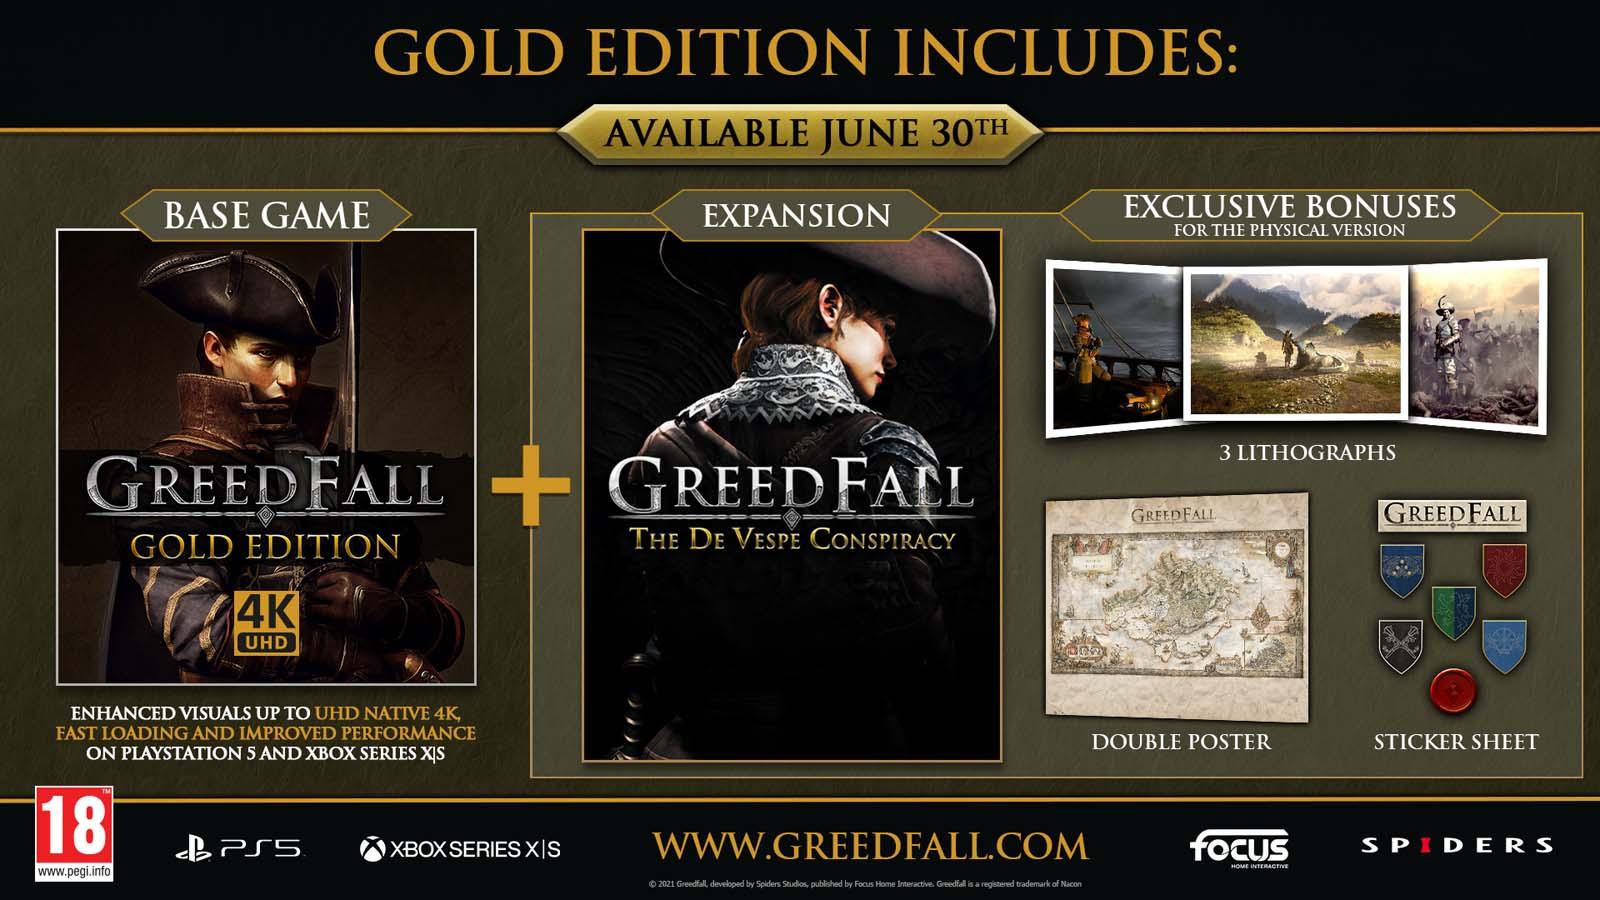 GreedFall Gold Edition retail promo